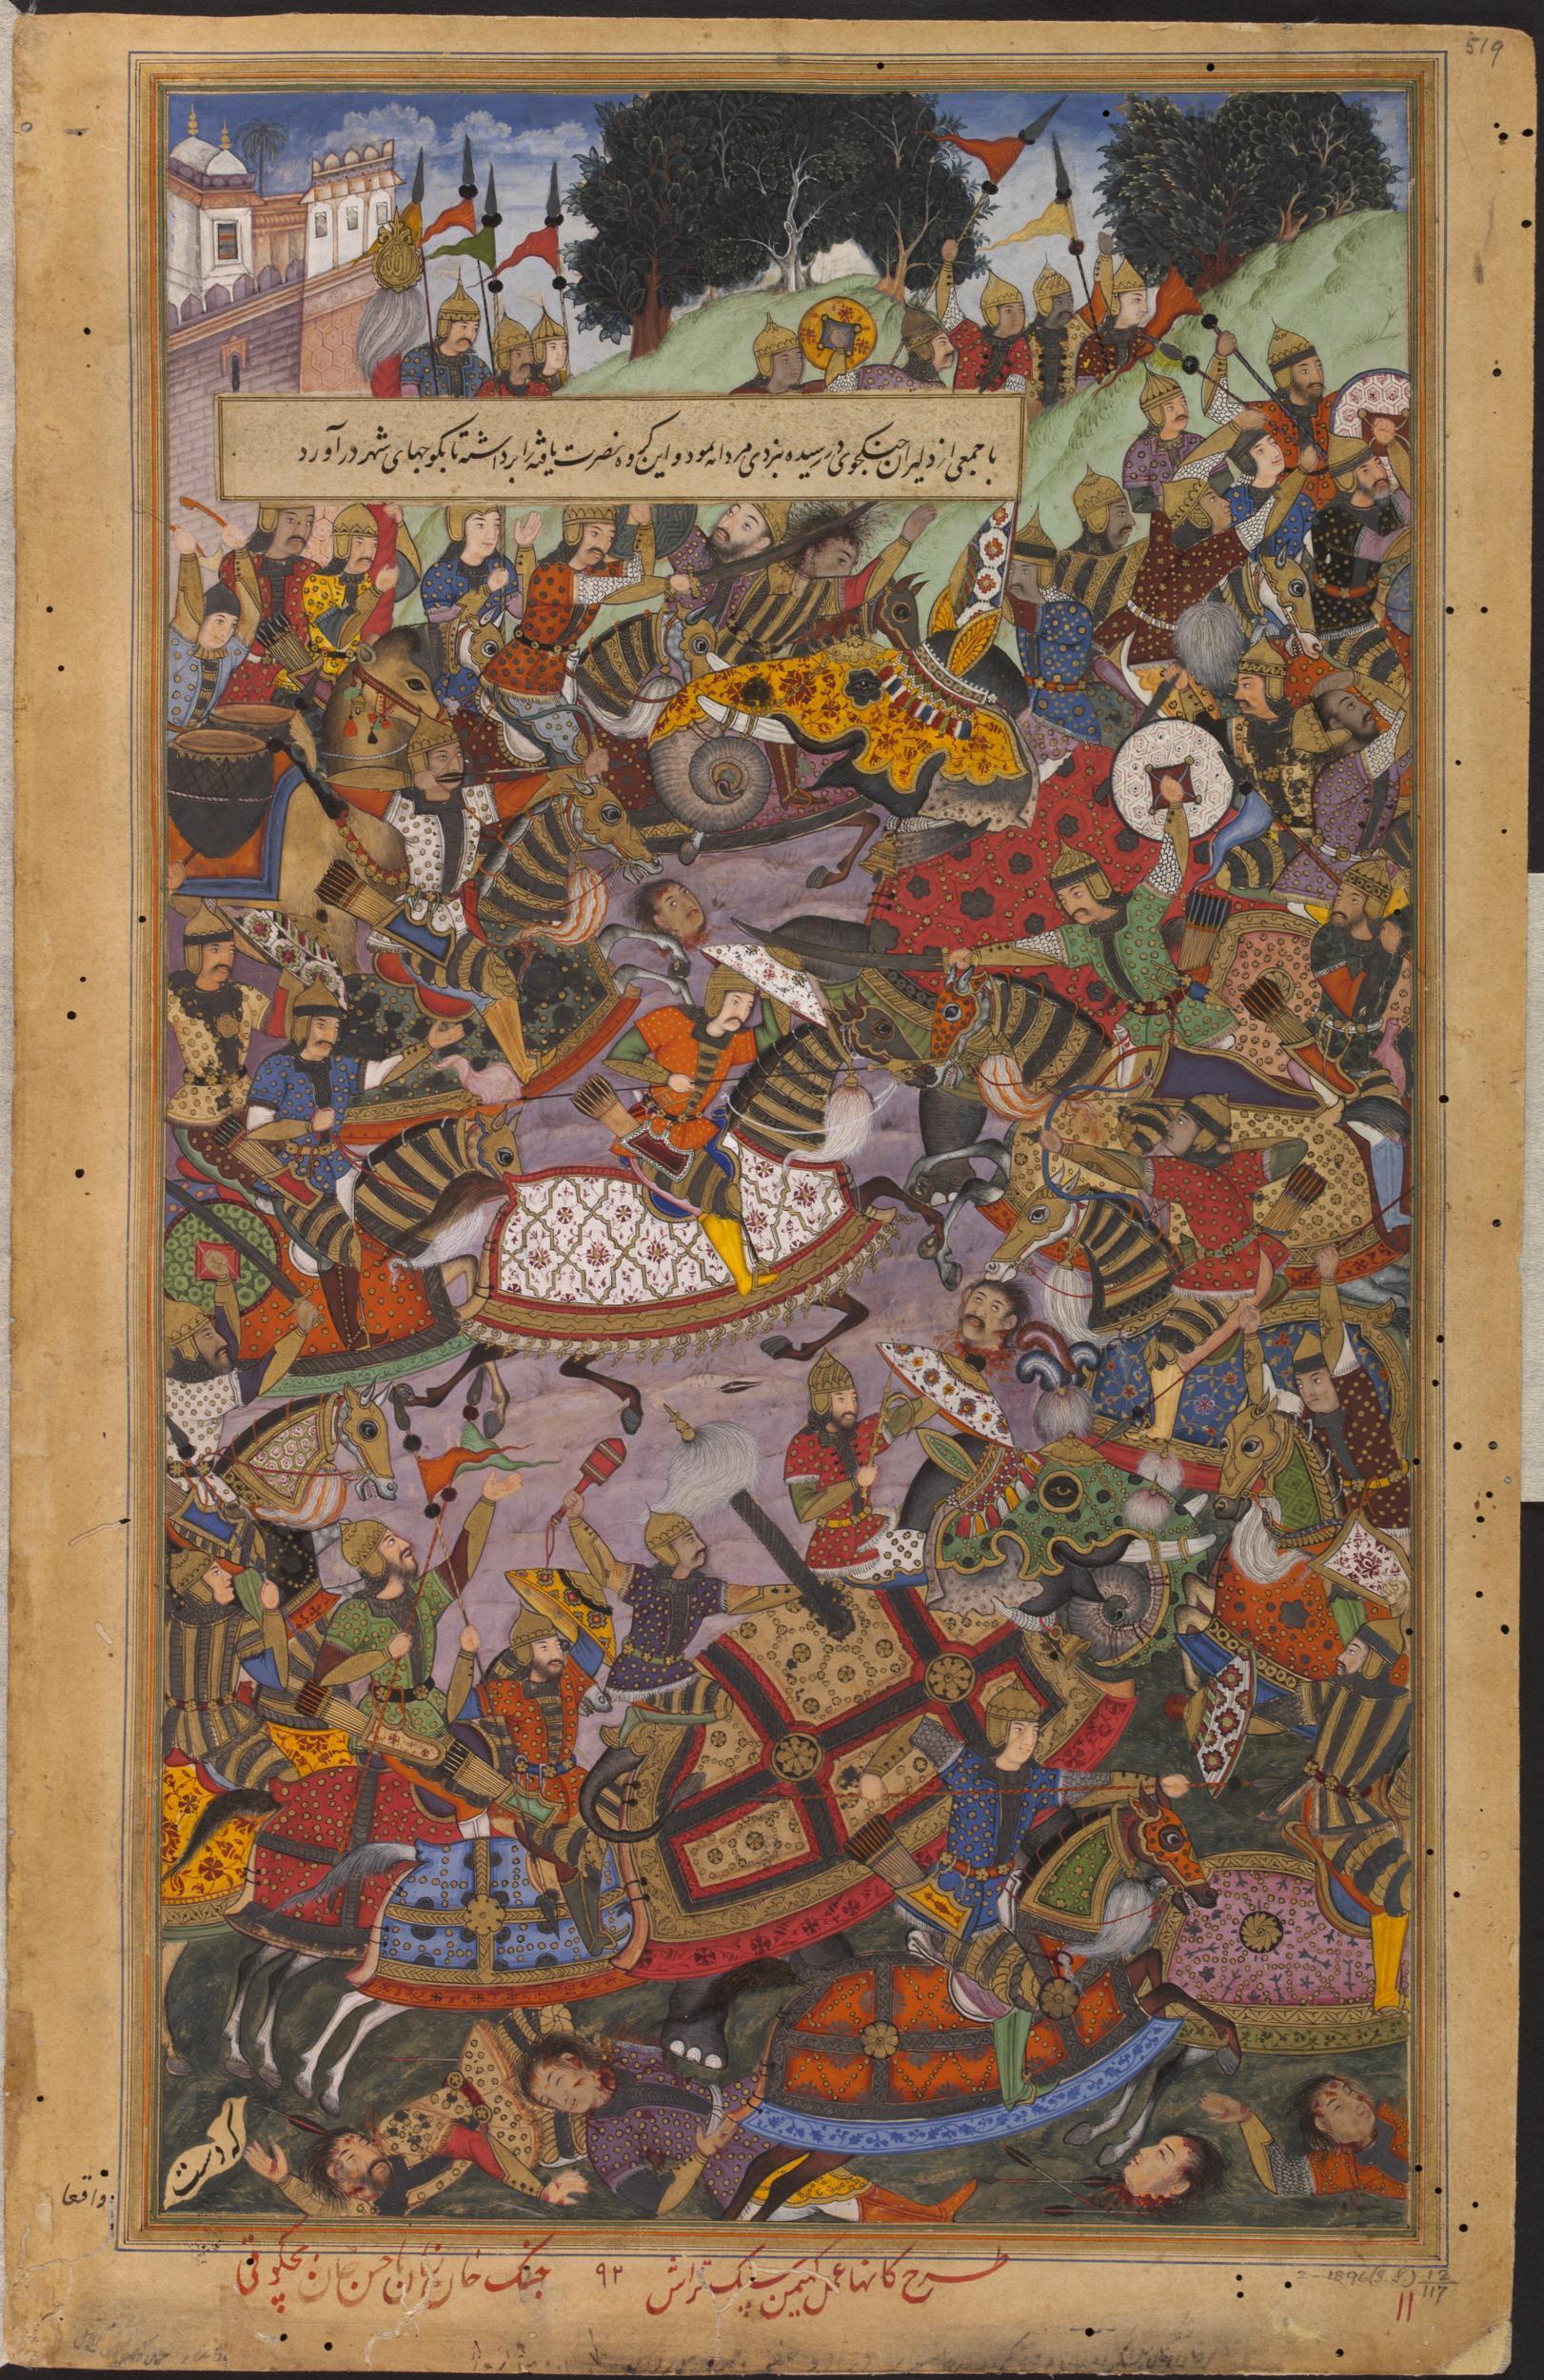 The victory of Khan Zaman (Ali Quli Khan) over the Afghans on the banks of the river Jumna in 1561, illustration of Akbarnama (Book of Akbar), cr. 1590-95, Kanha and Khiman Sangtarash, Mughal Empire